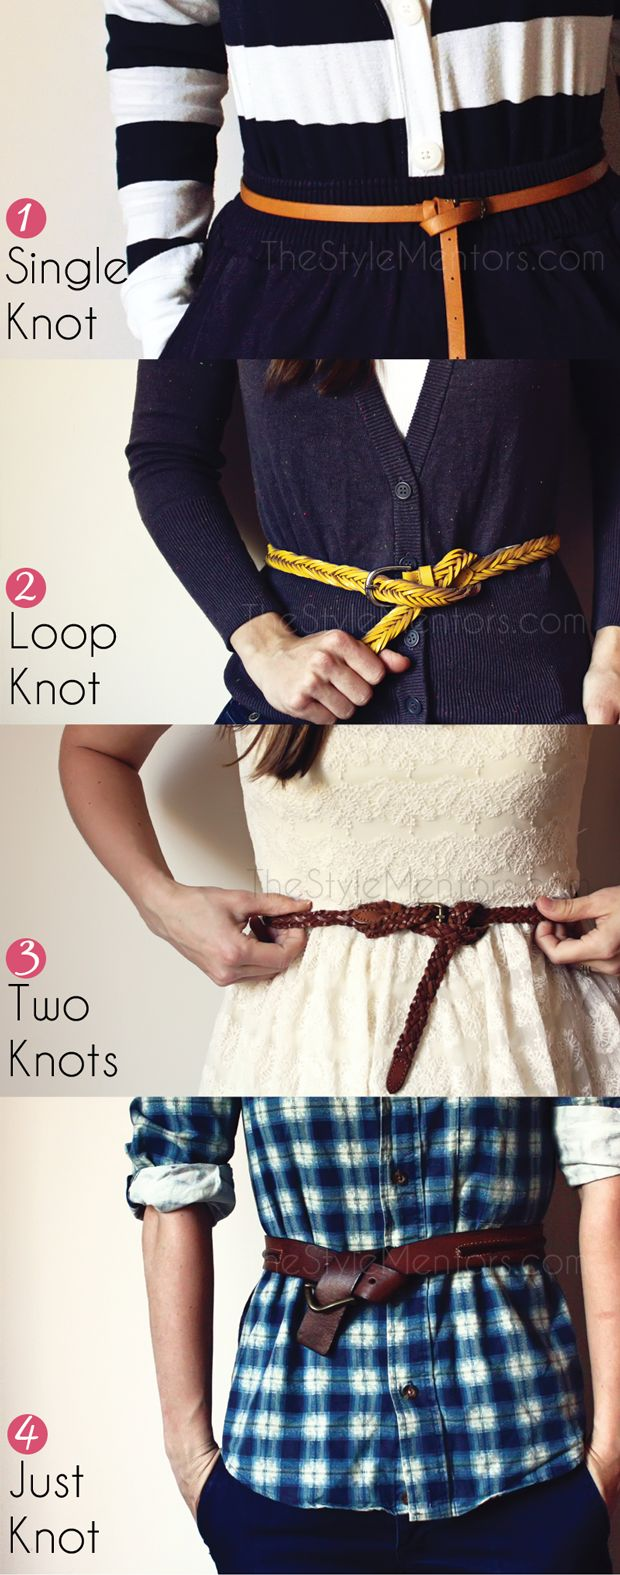 4 ways to knot a belt